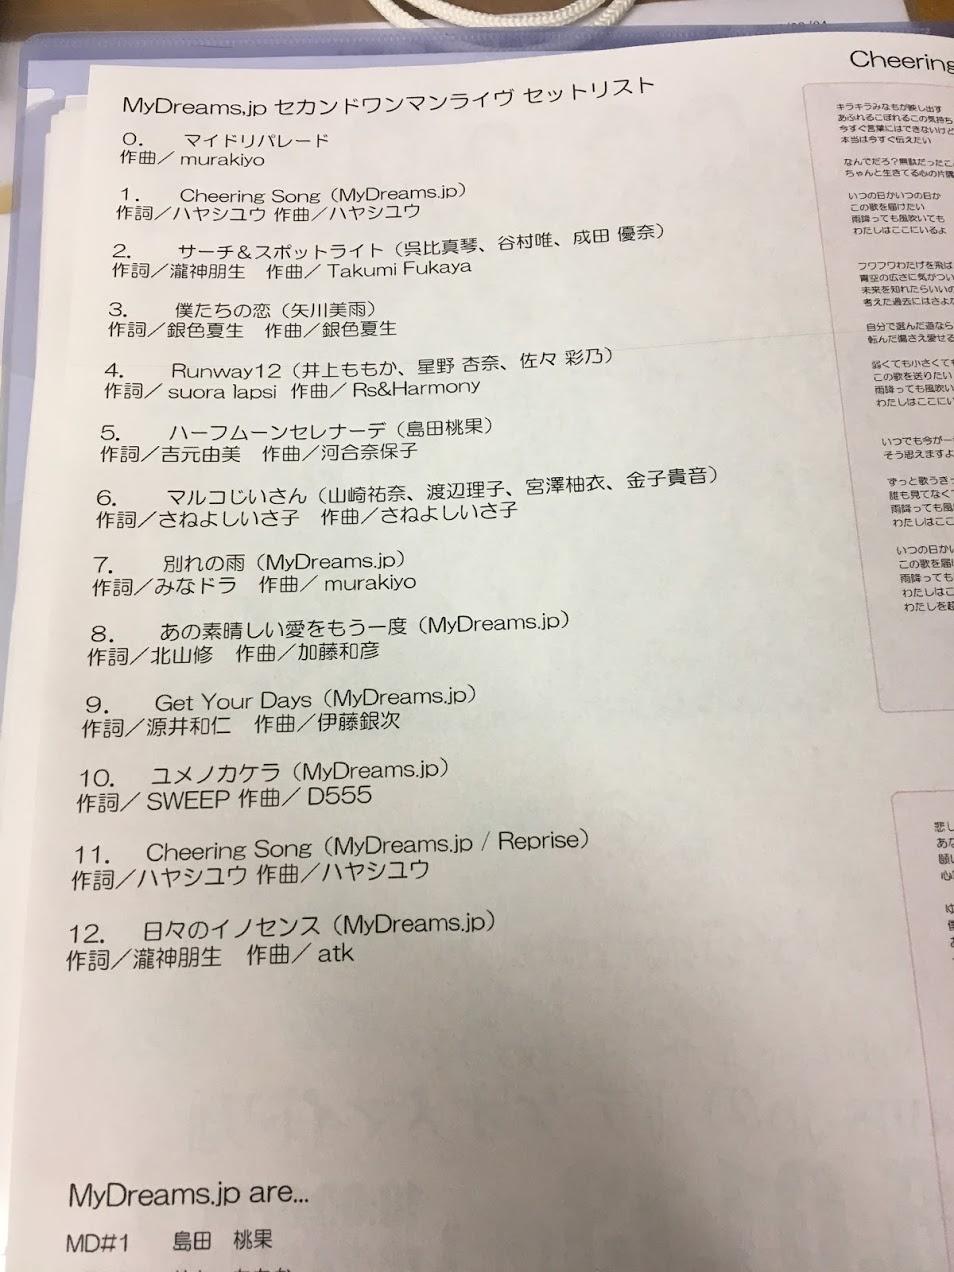 mydreams.jp『アケオメマイドリ』にて「cheering song」を発表